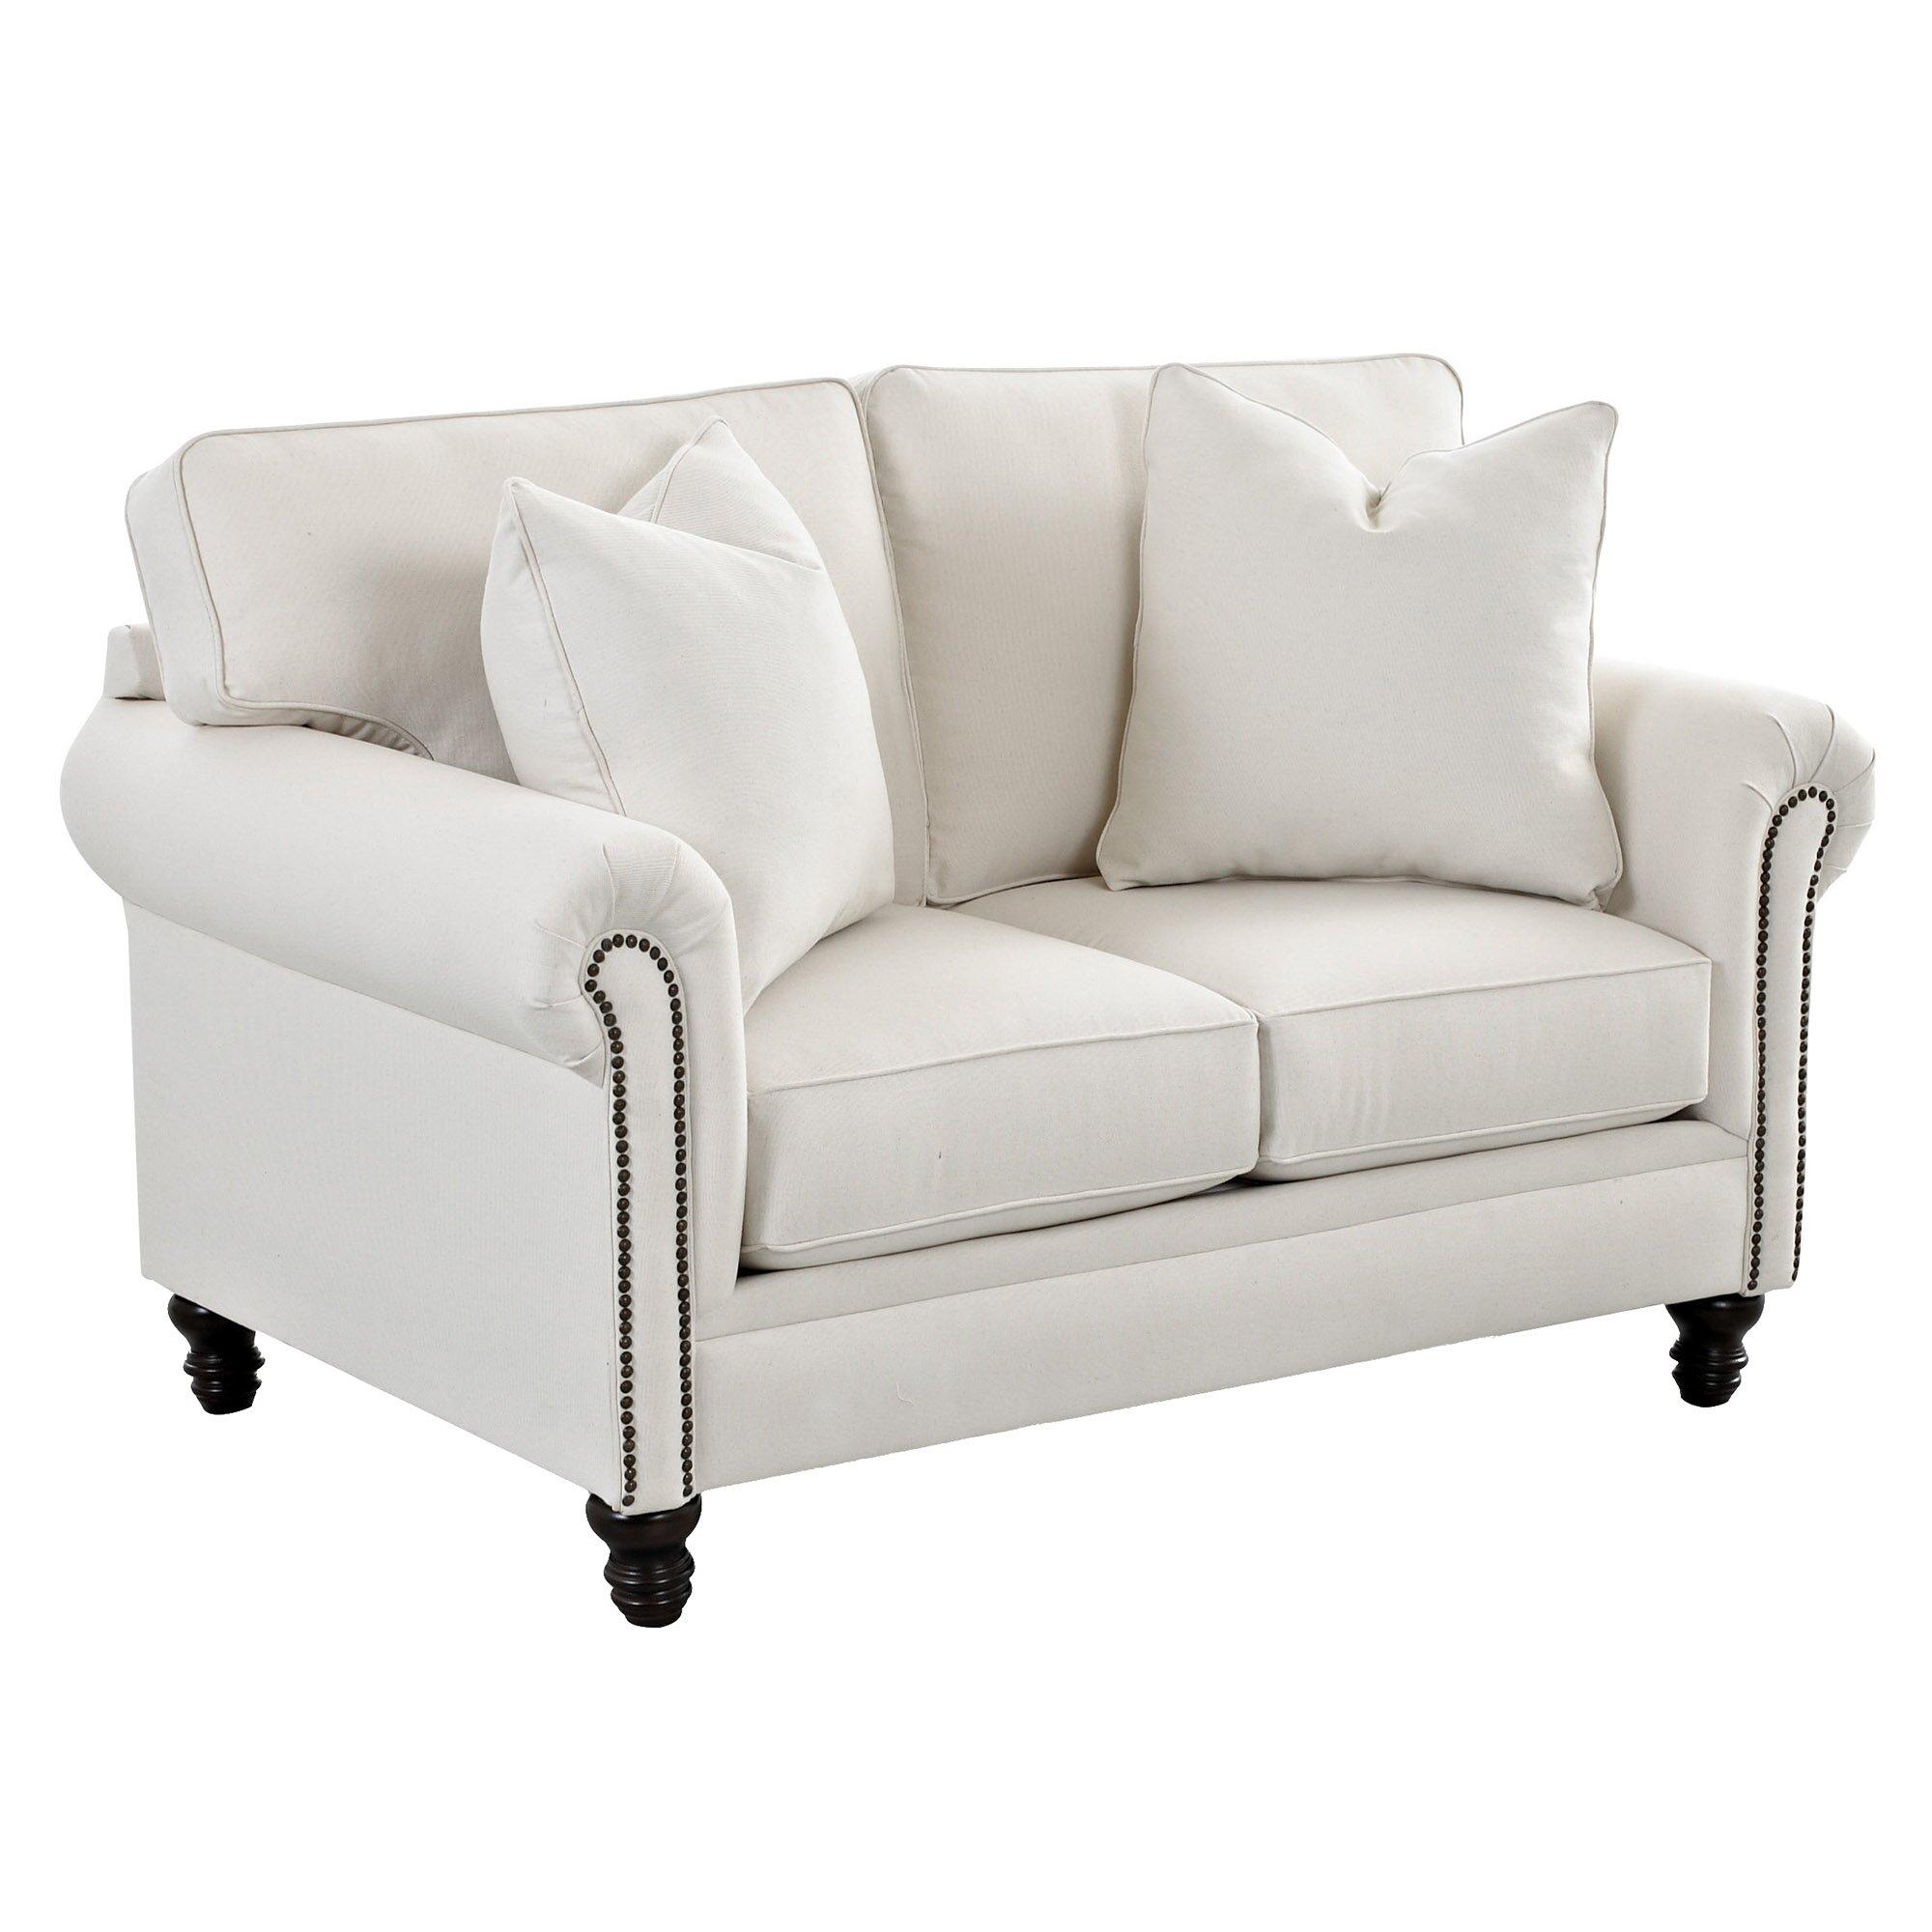 Wayfair Custom Upholstery Vivian Loveseat Reviews Wayfair